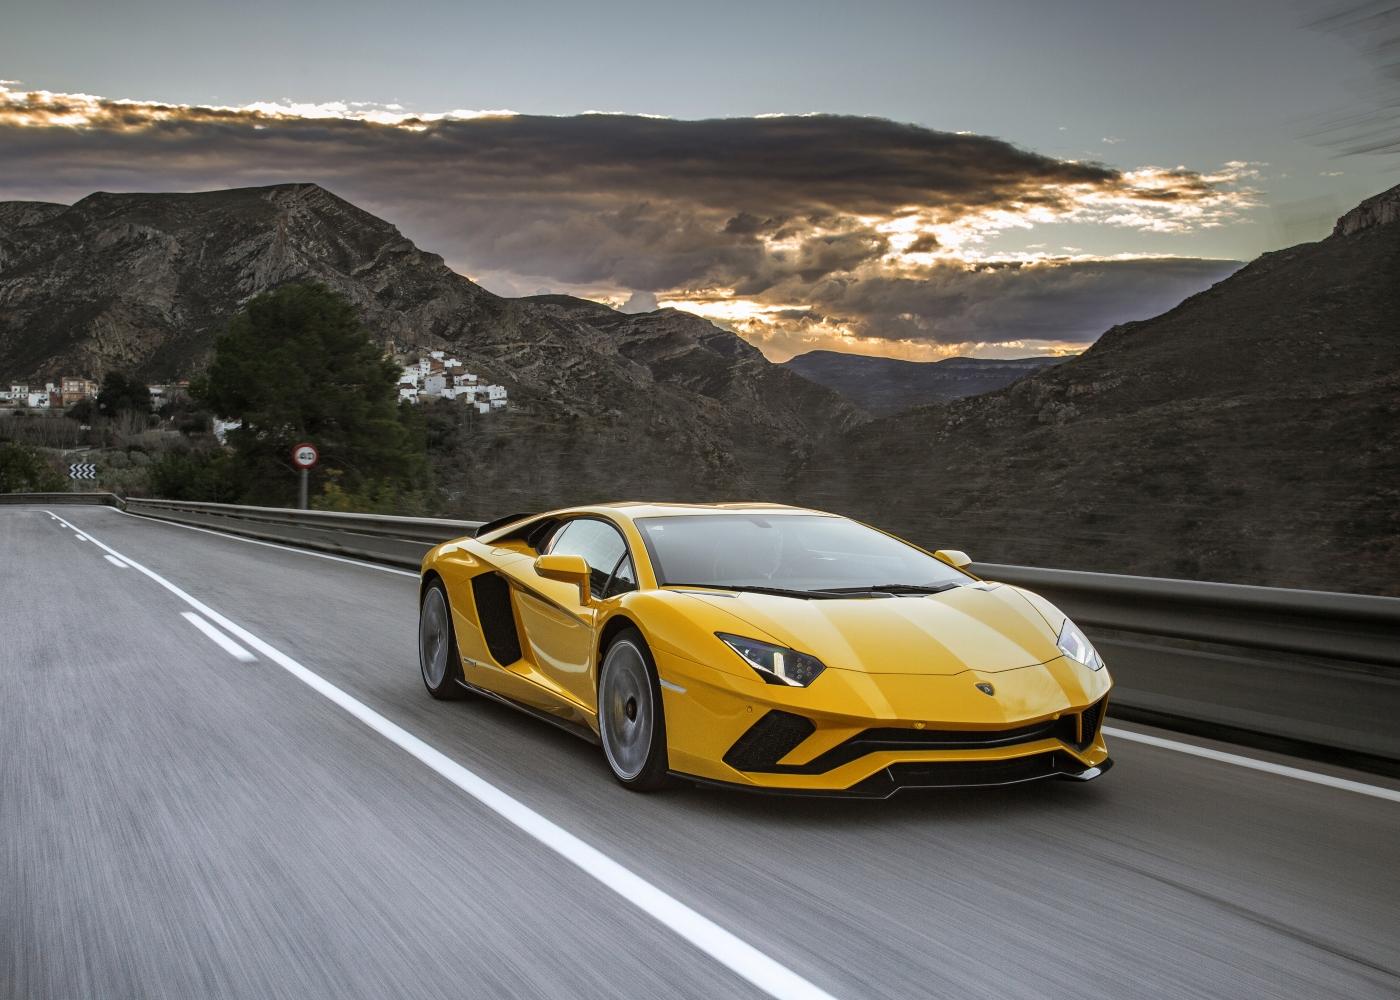 Lamborghini Aventador